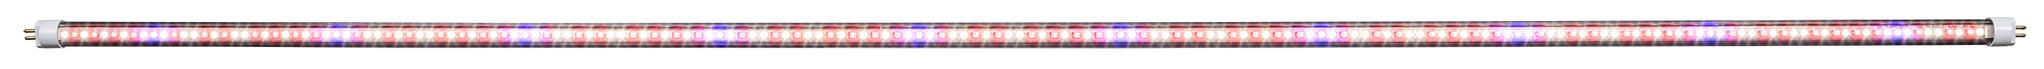 iSunlight 41w T5 4ft Bloom